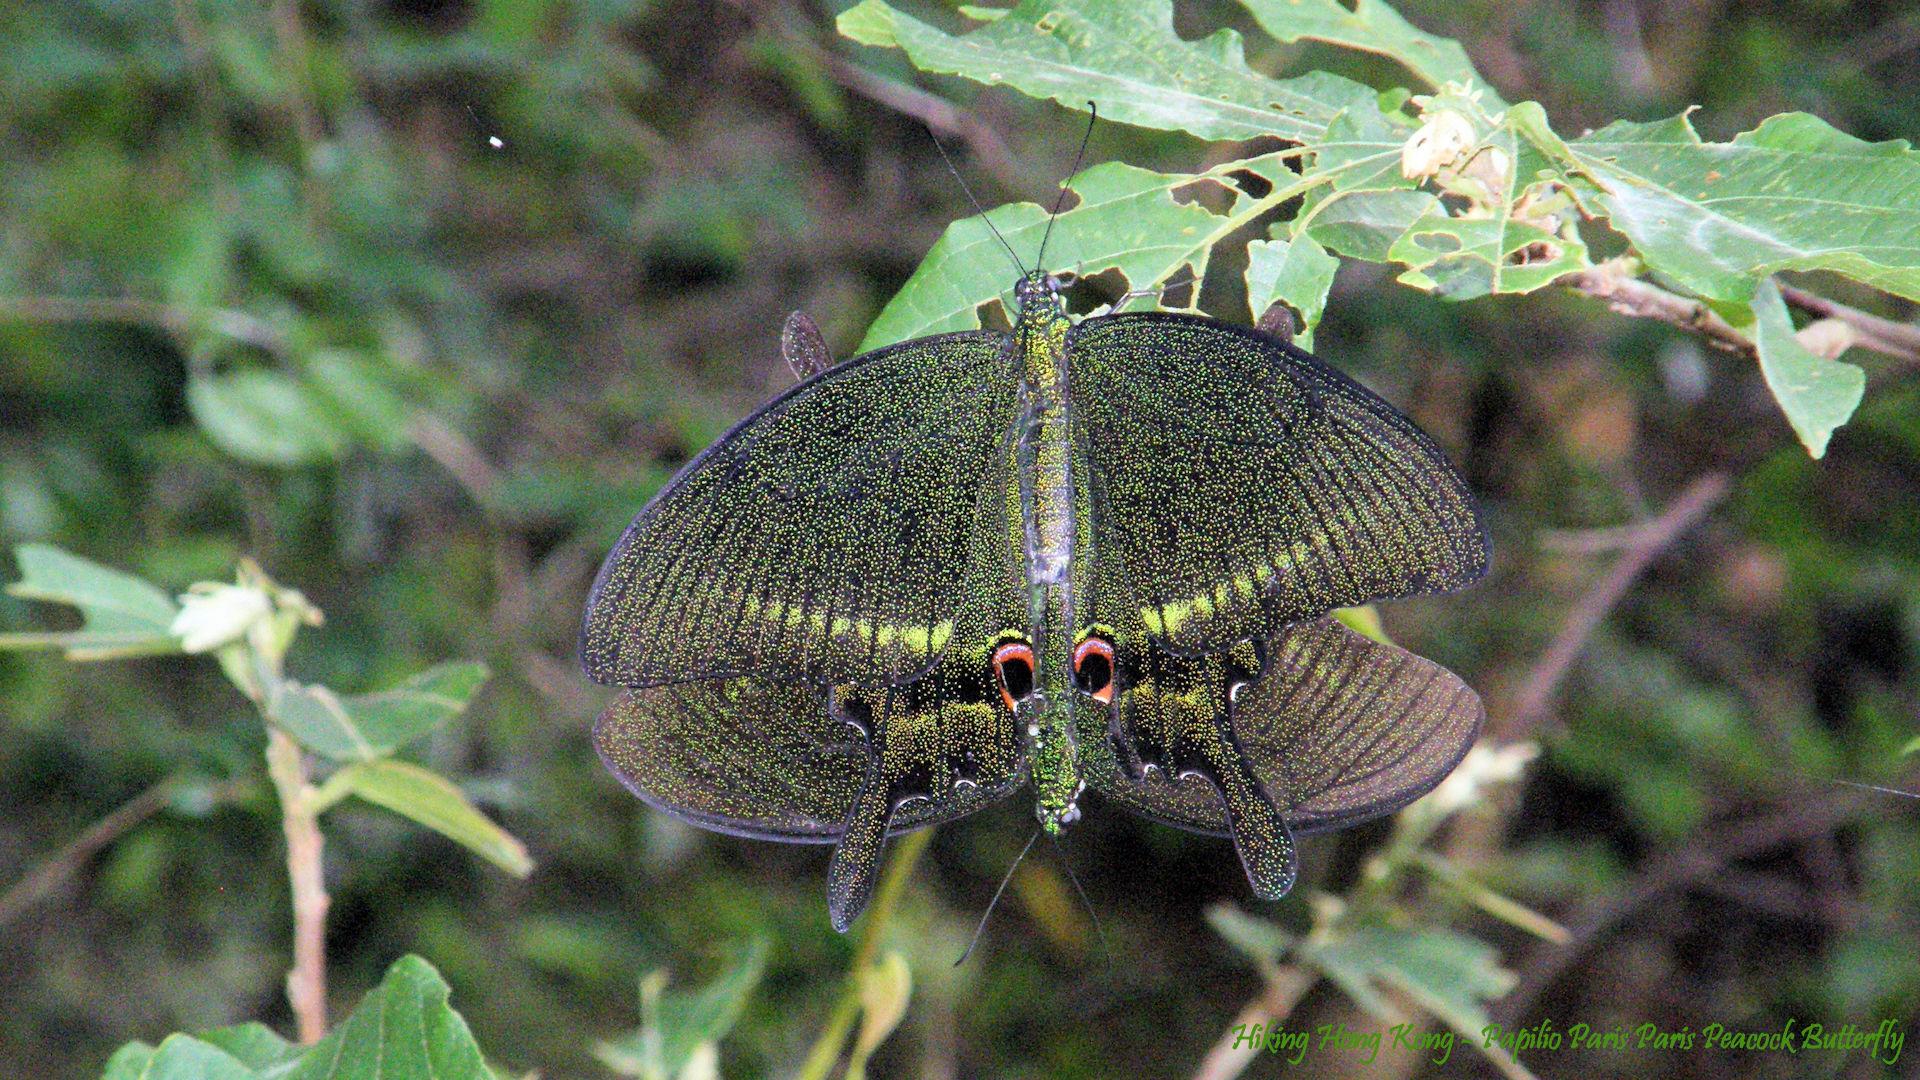 Hong-Kong-Butterfly-Papilio-Paris-Peacock-Butterfly-Hiking-Hong-Kong-wallpaper-wpc5805982